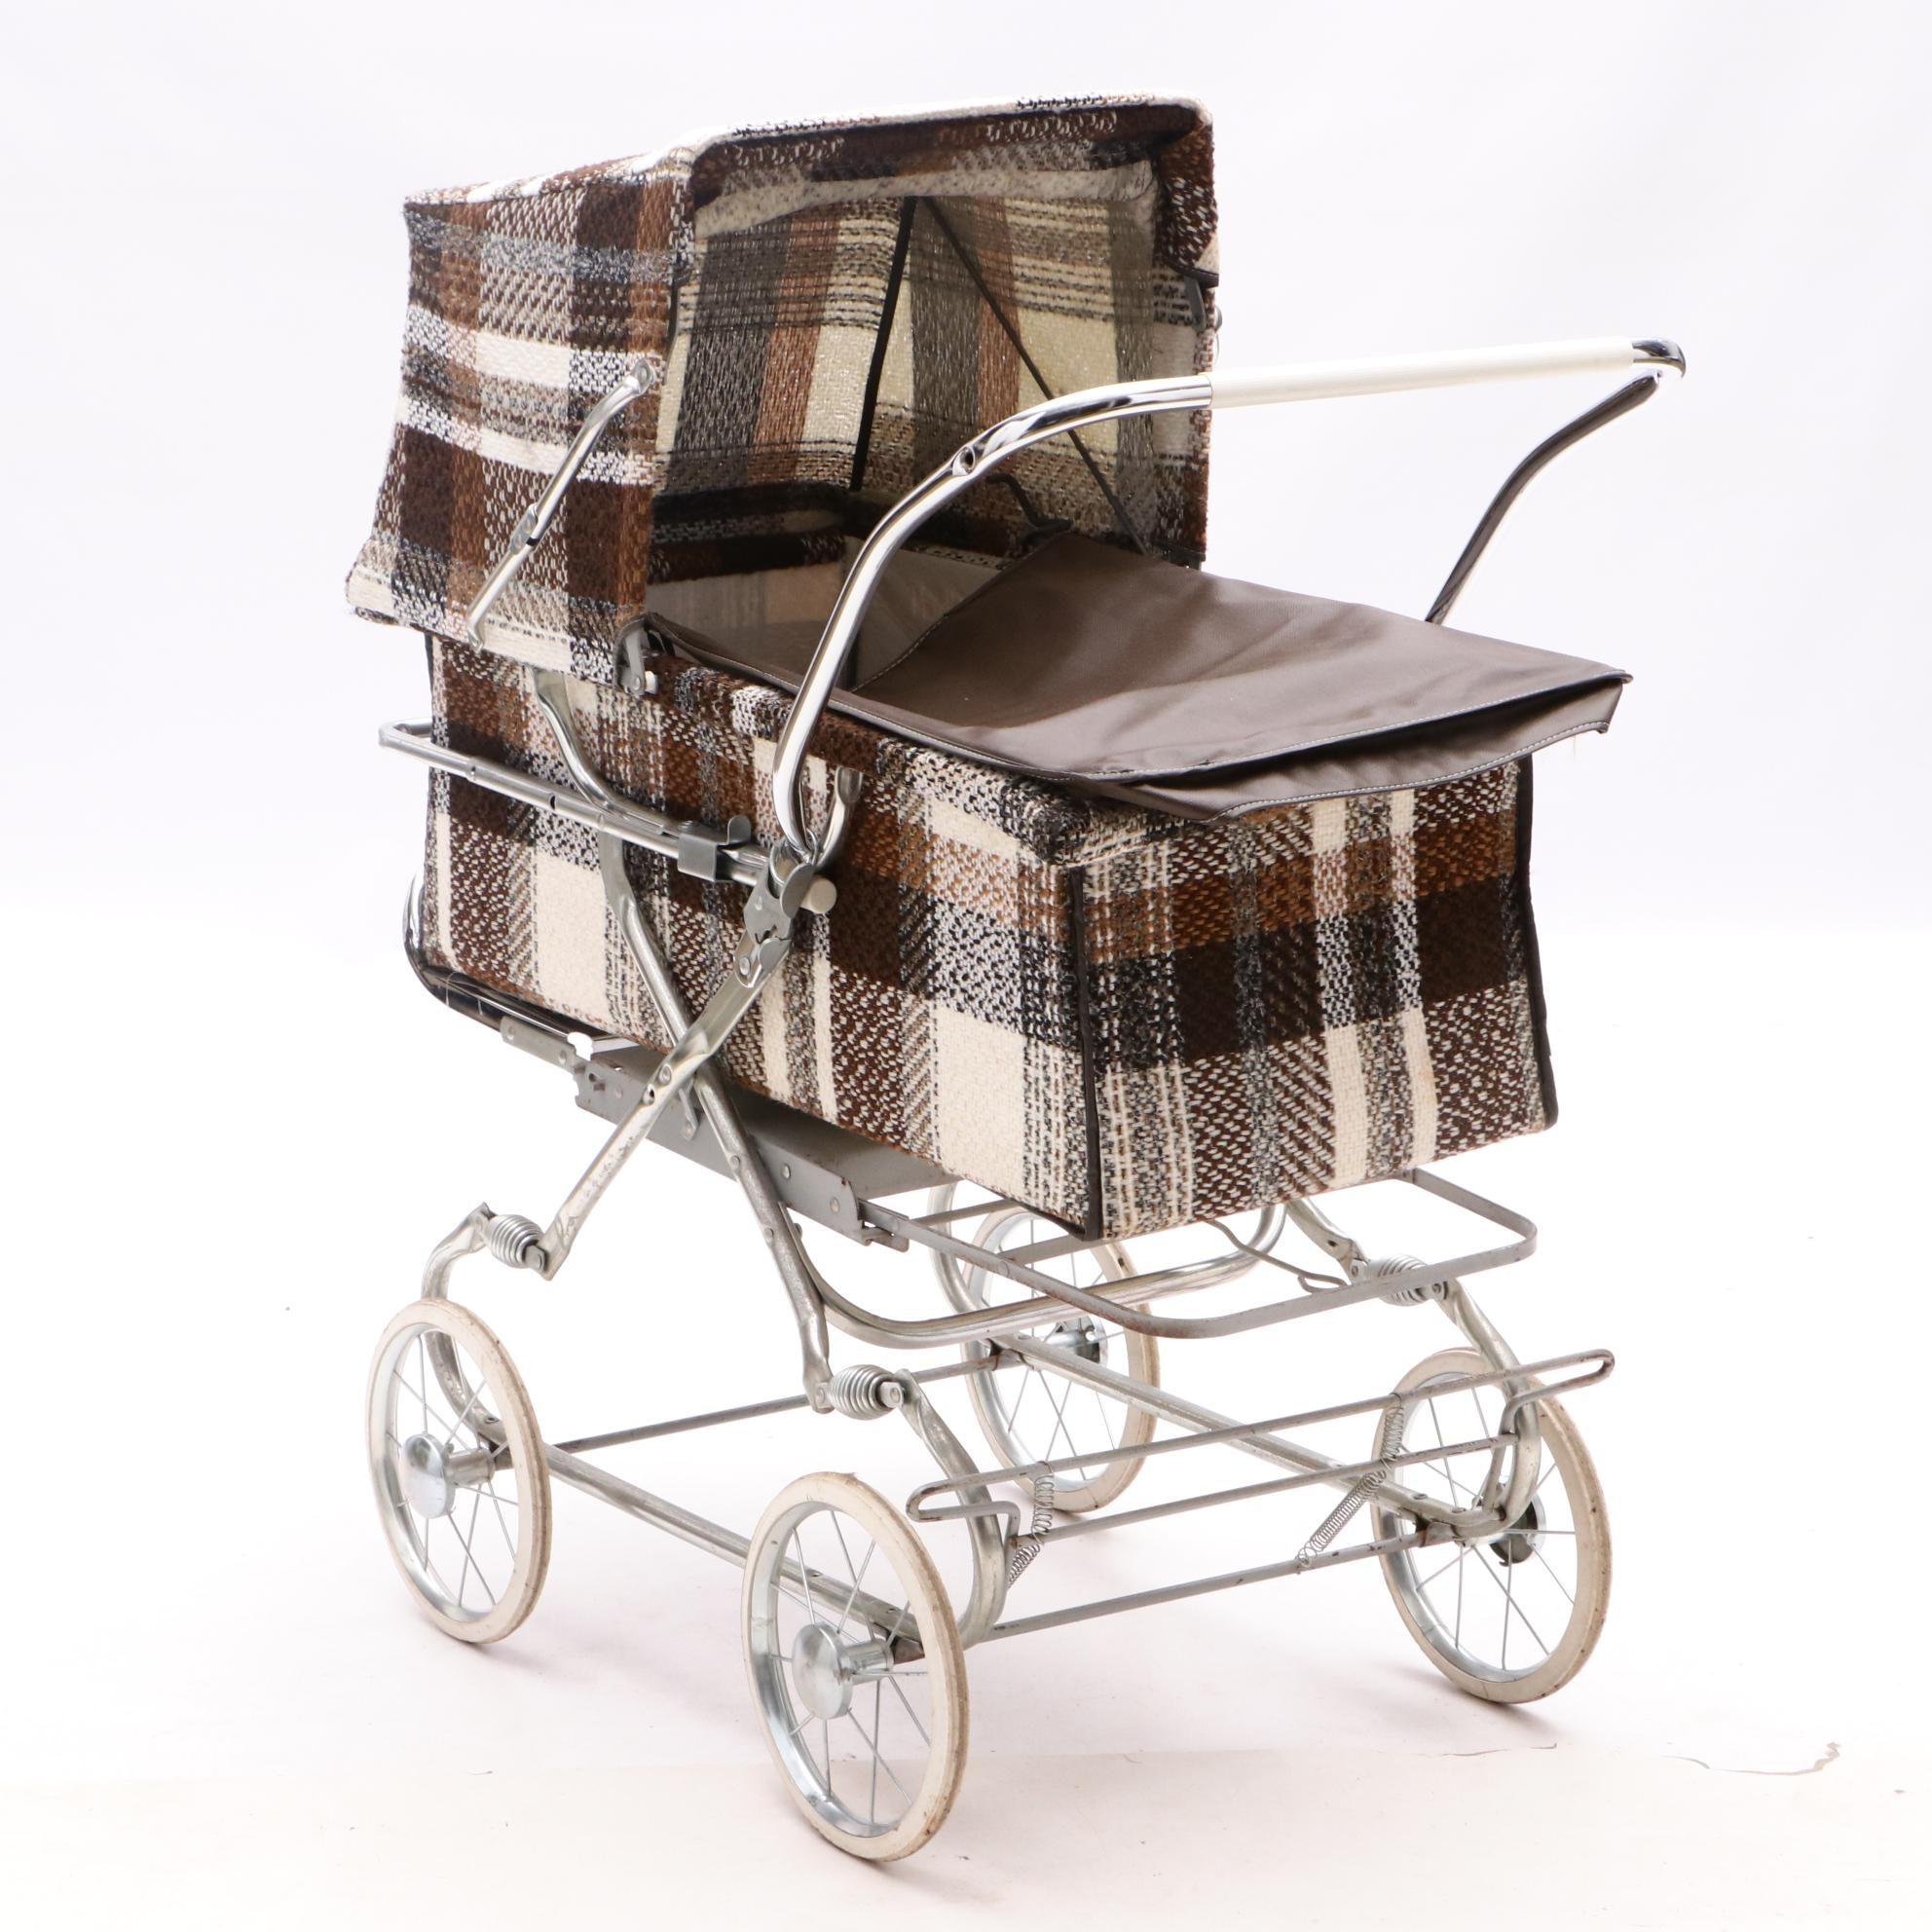 Vintage Three Way Baby Carriage by Bilt Rite Mfg.